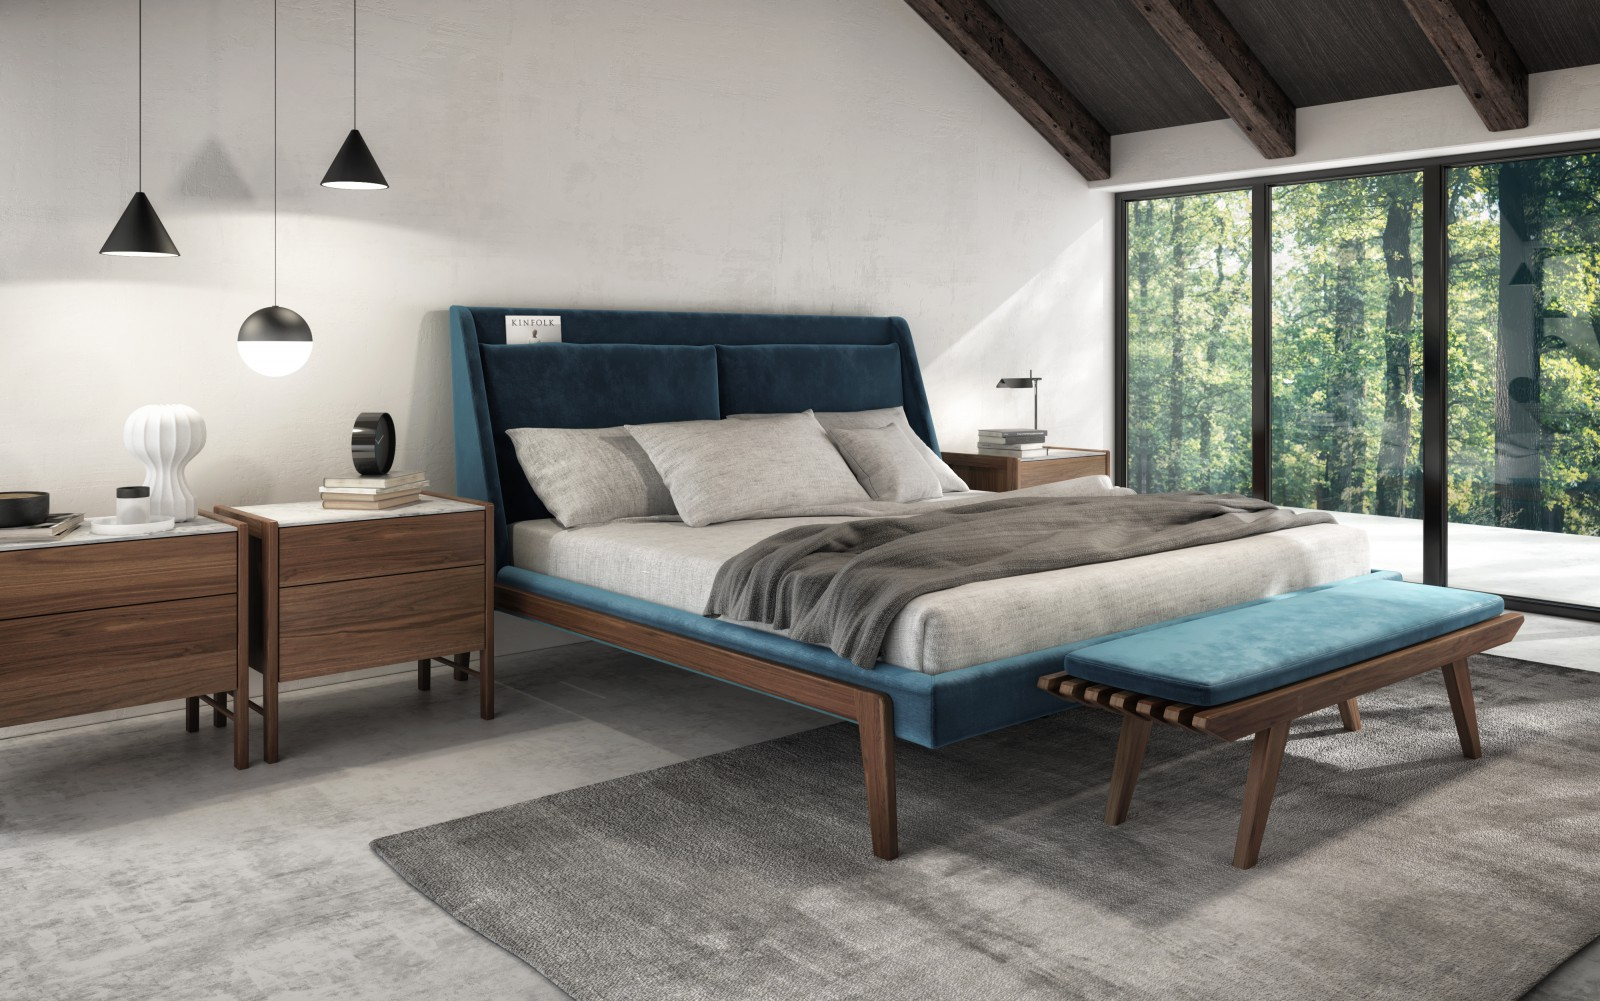 huppe bedding at Park furnishings